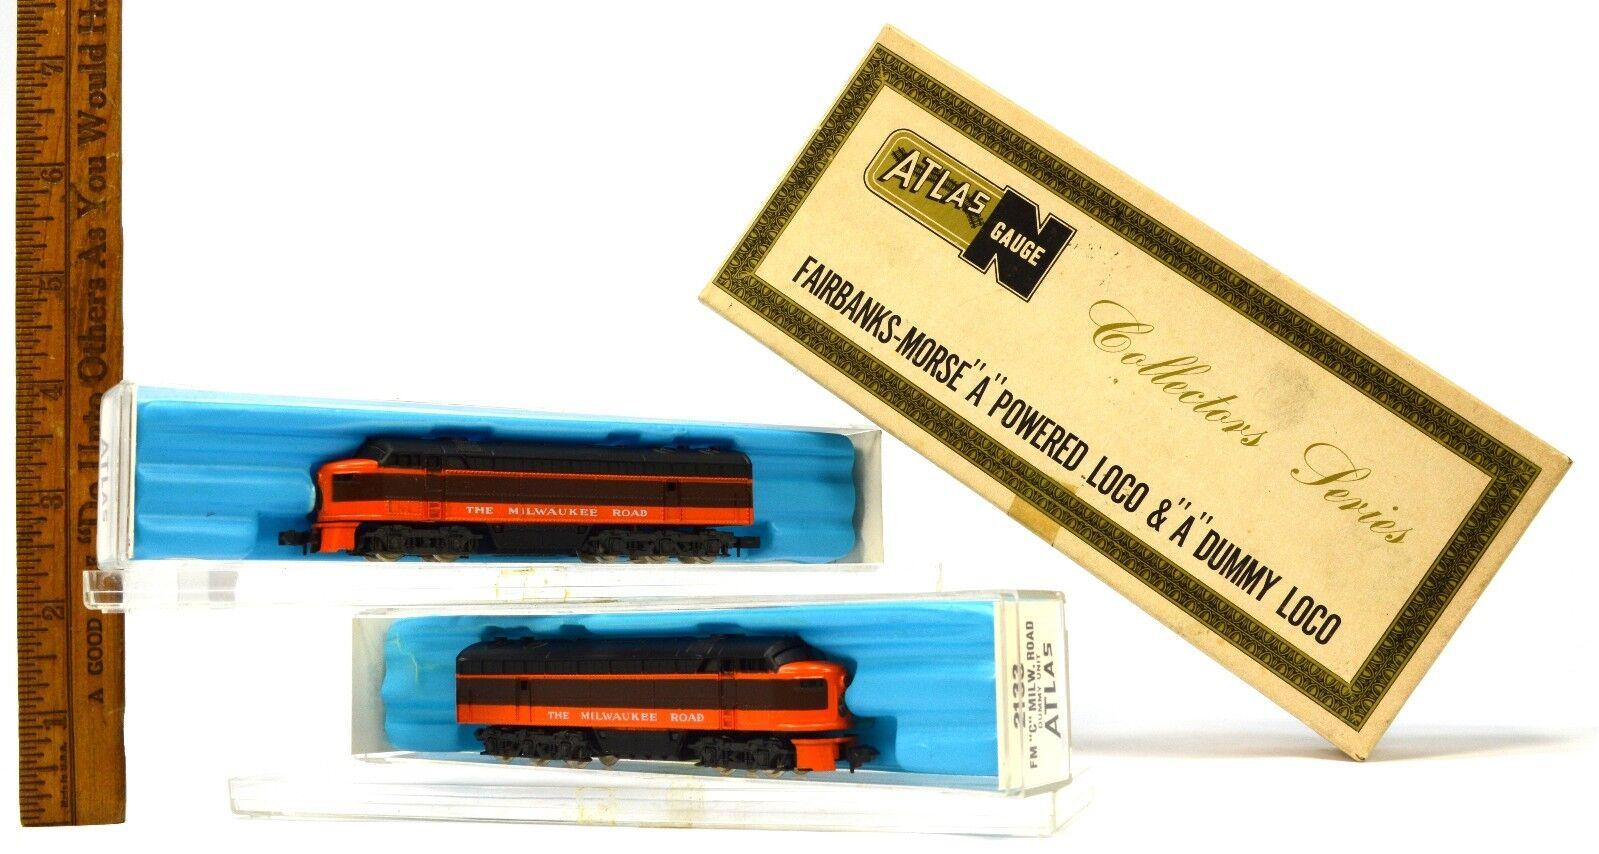 Vintage ATLAS N-TRAINS in Box    FAIRBANKS-MORSE Powered & Dummy LOCO & 2133 9c2294